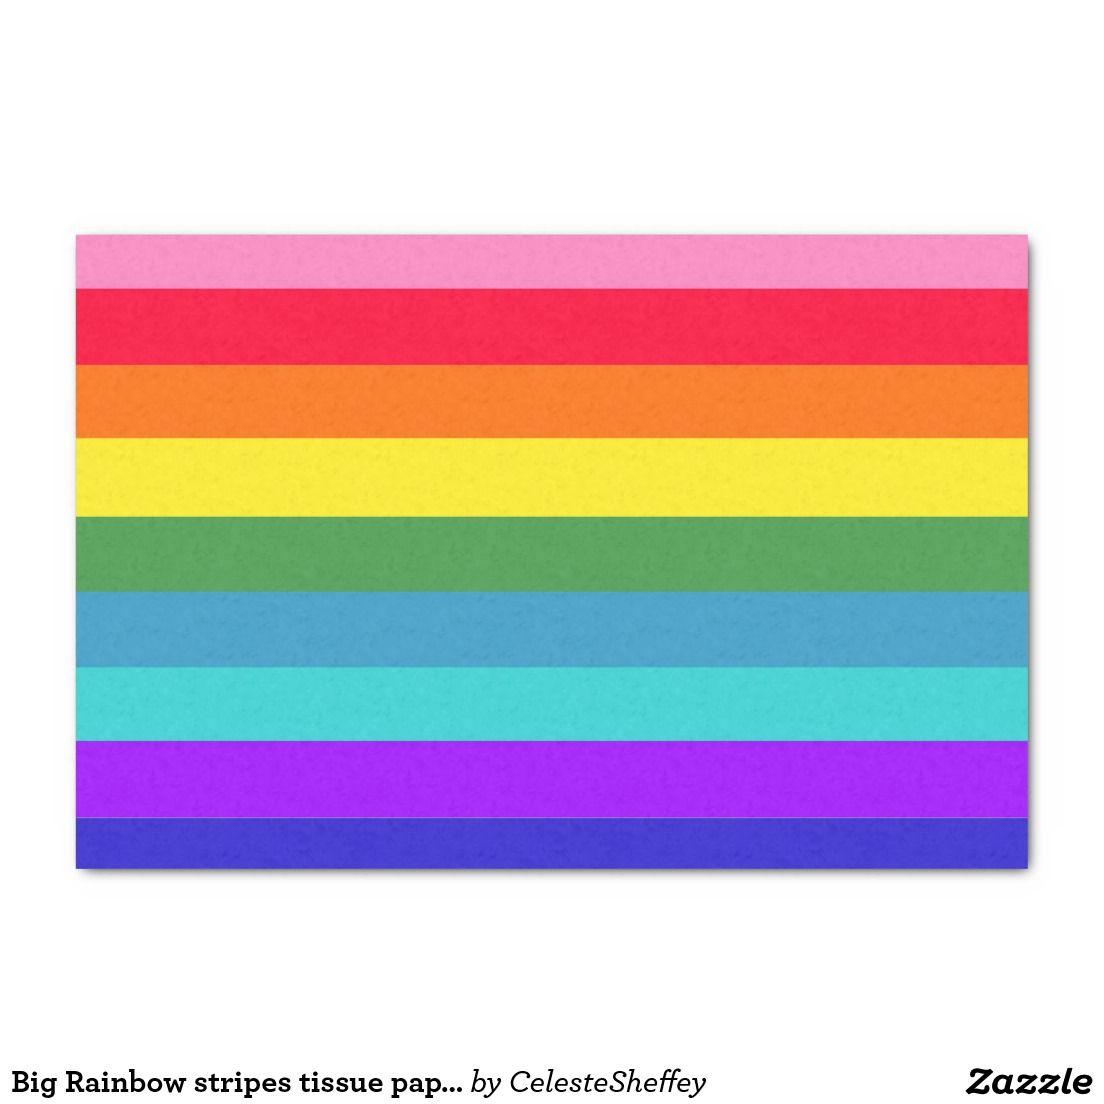 "Big Rainbow stripes tissue paper 10"" X 15"" Tissue Paper"